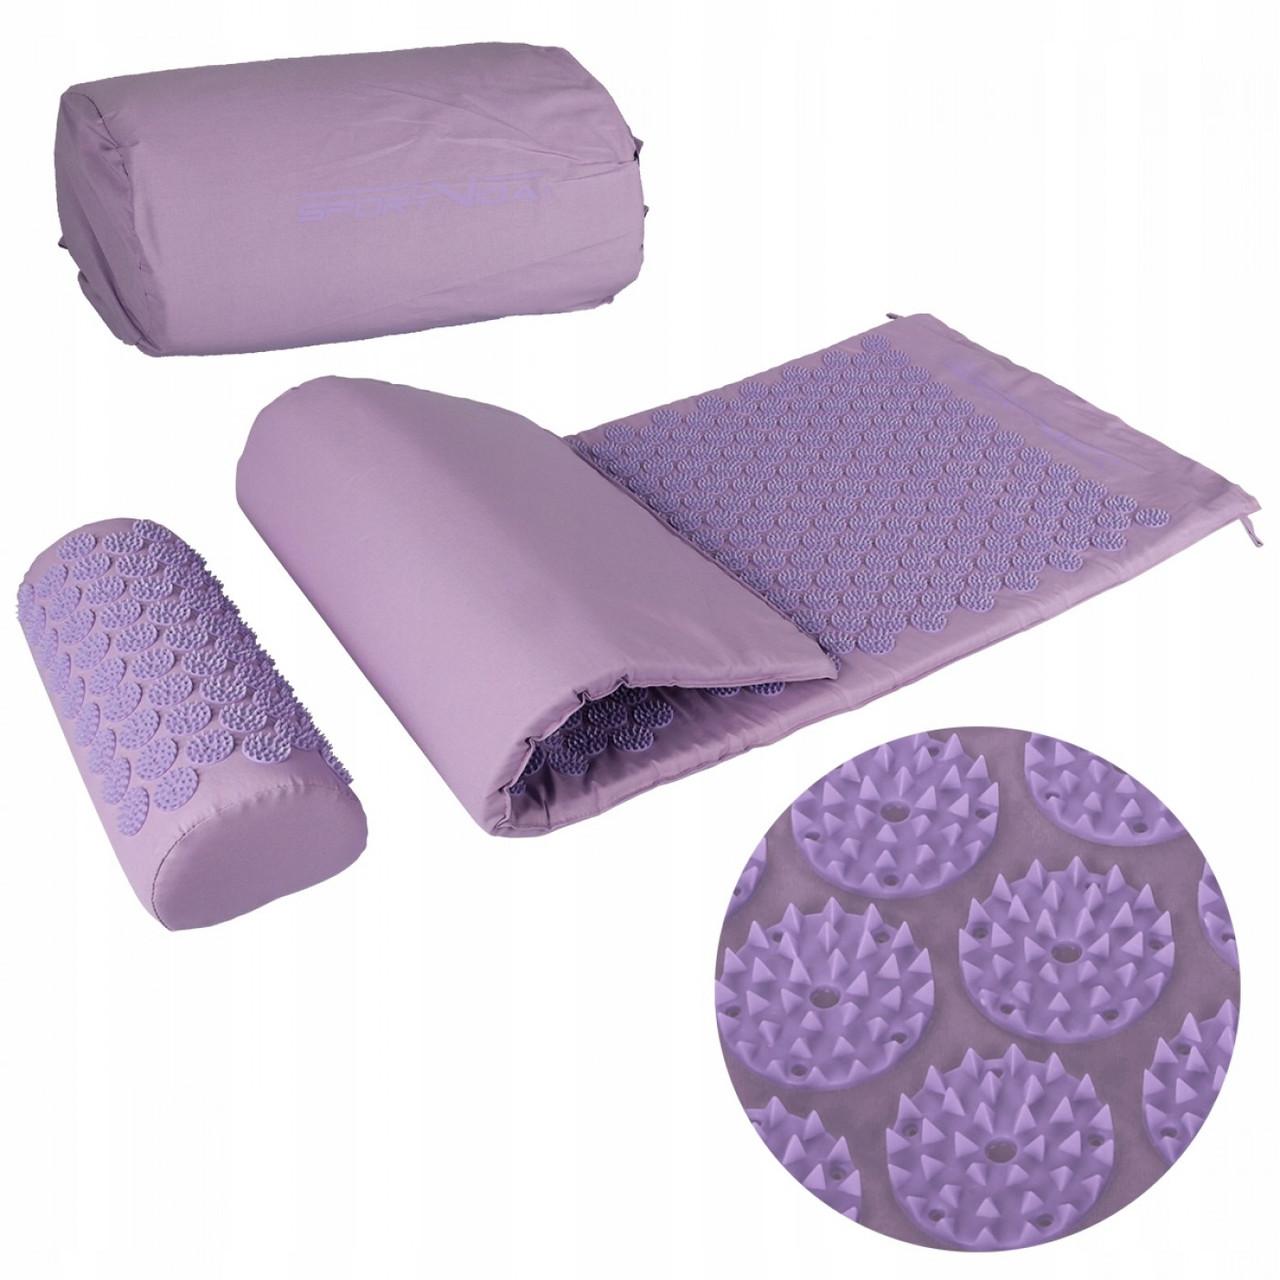 Коврик акупунктурный с валиком SportVida Аппликатор Кузнецова 130 x 50 см SV-HK0411 Purple/Purple - Love&Life